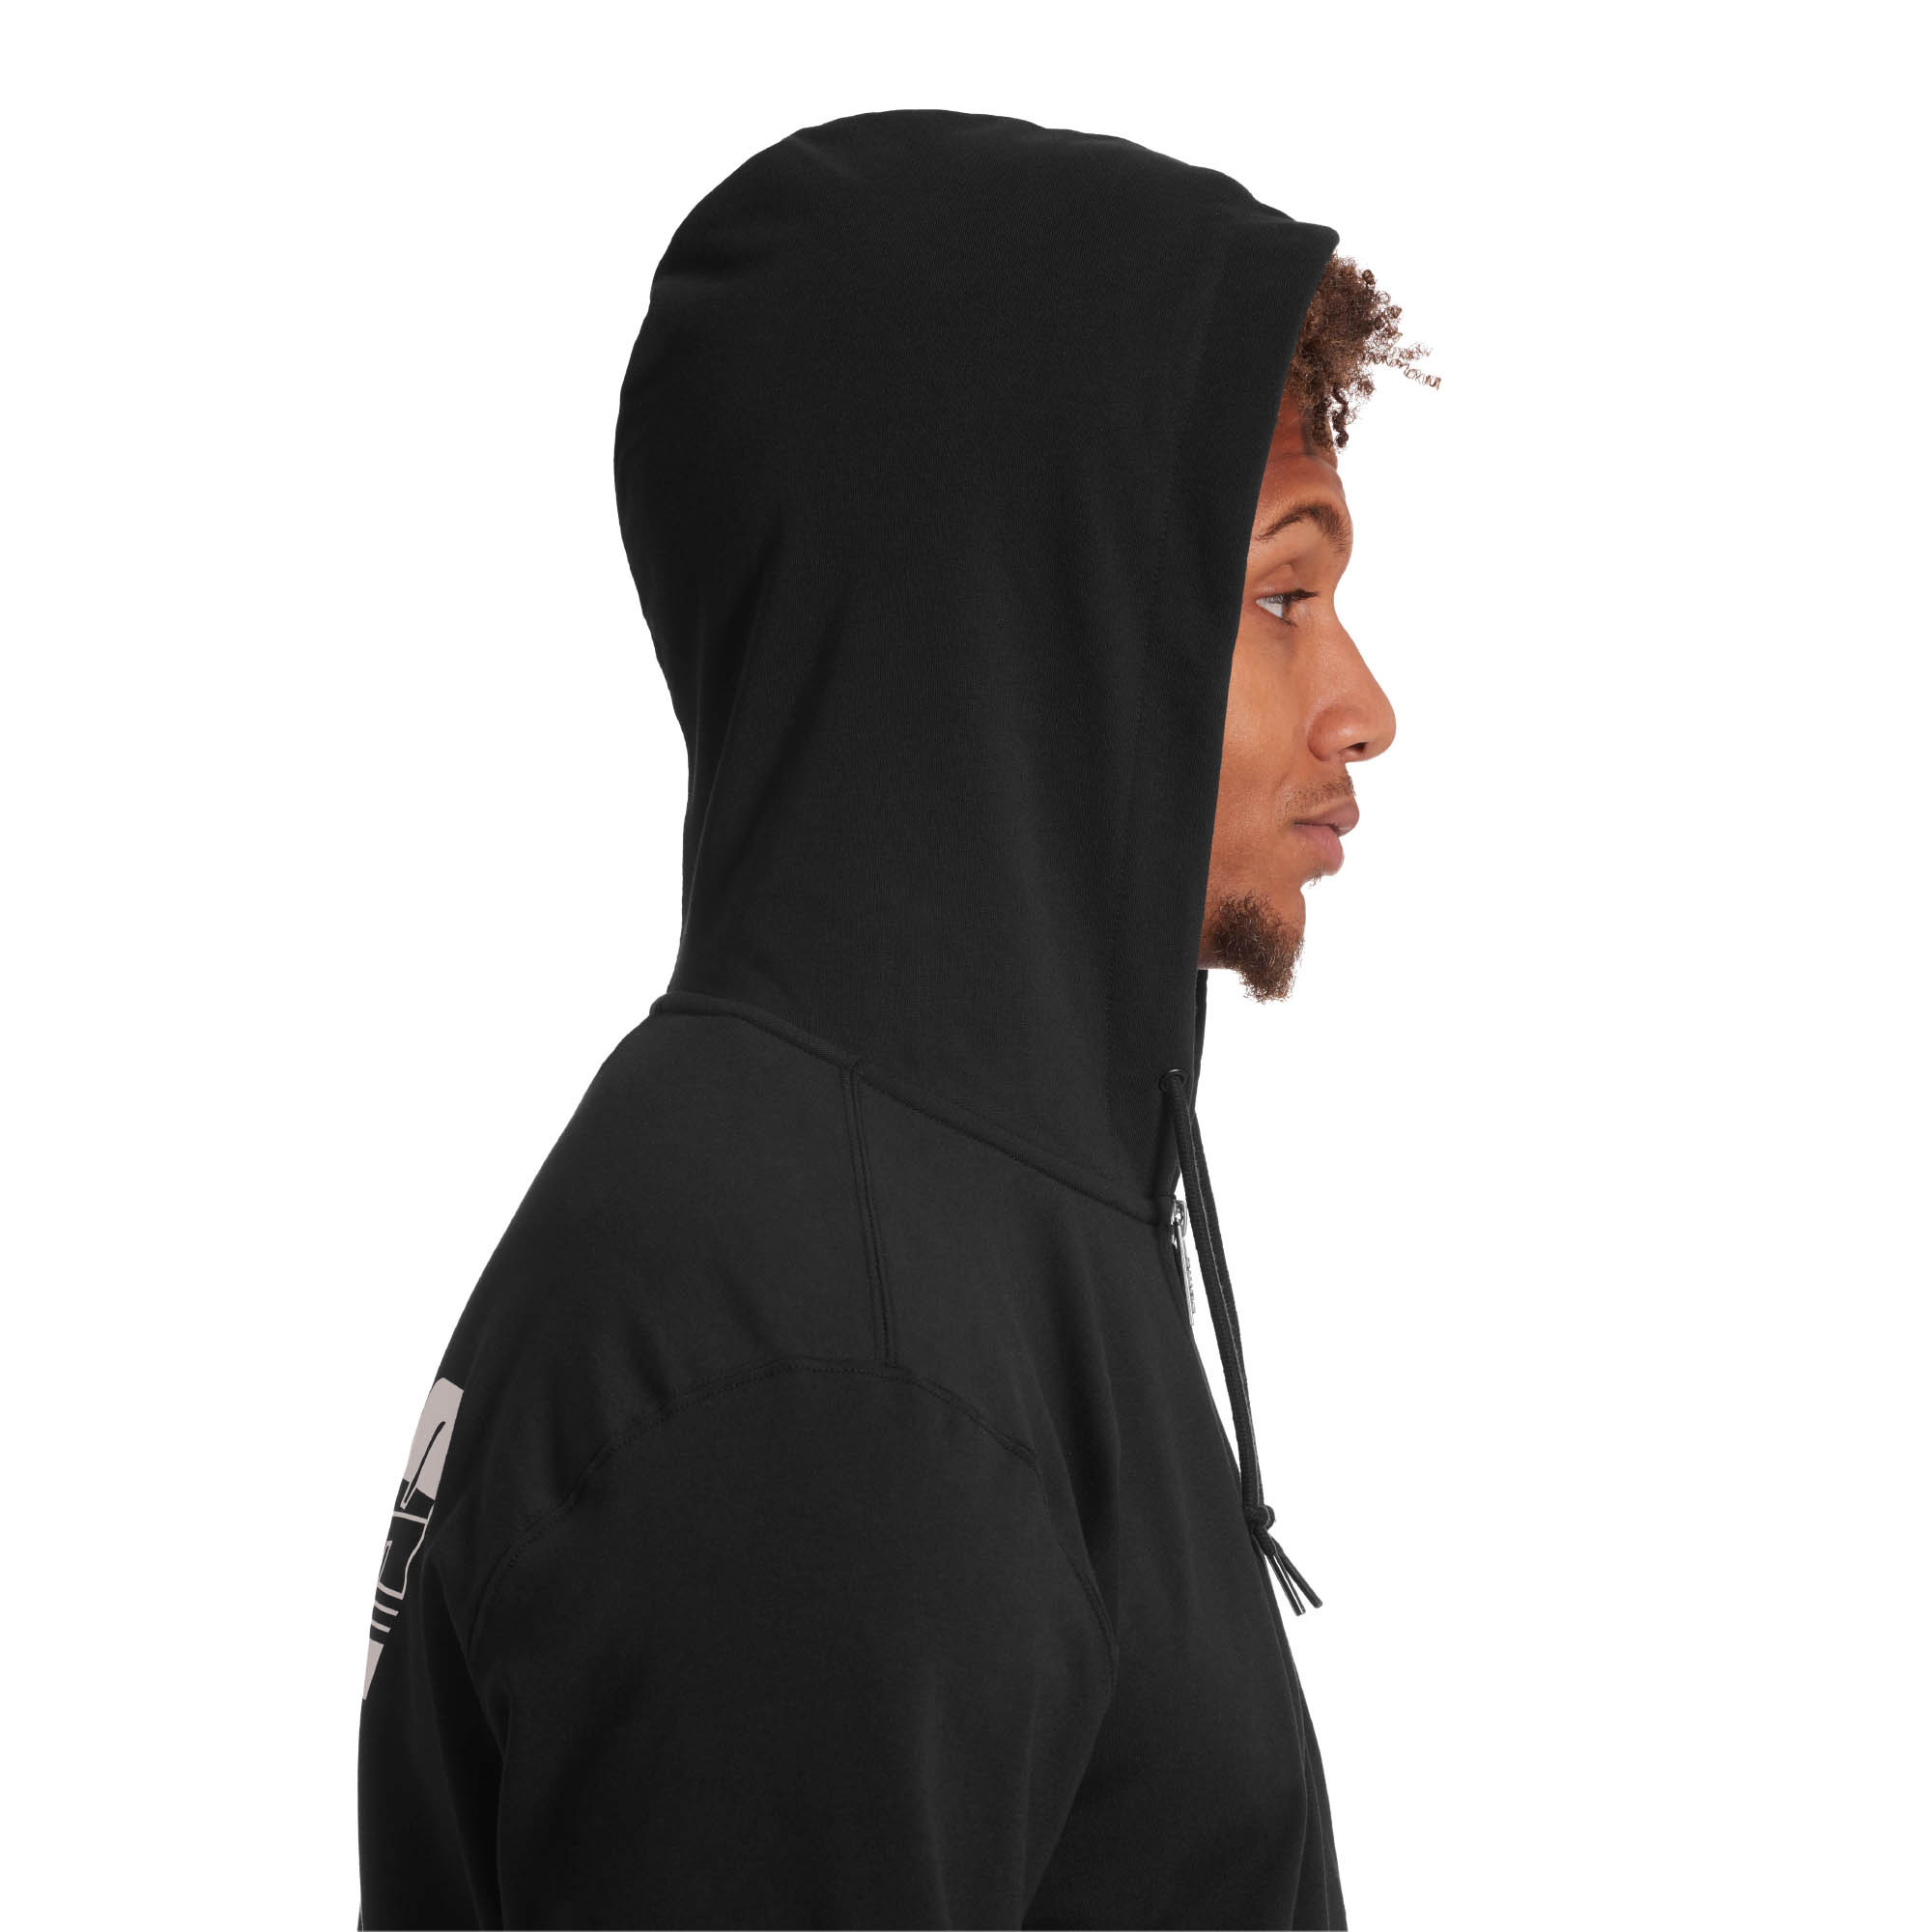 PUMA-Rebel-Men-s-Hooded-Jacket-Men-Sweat-Basics miniatura 7